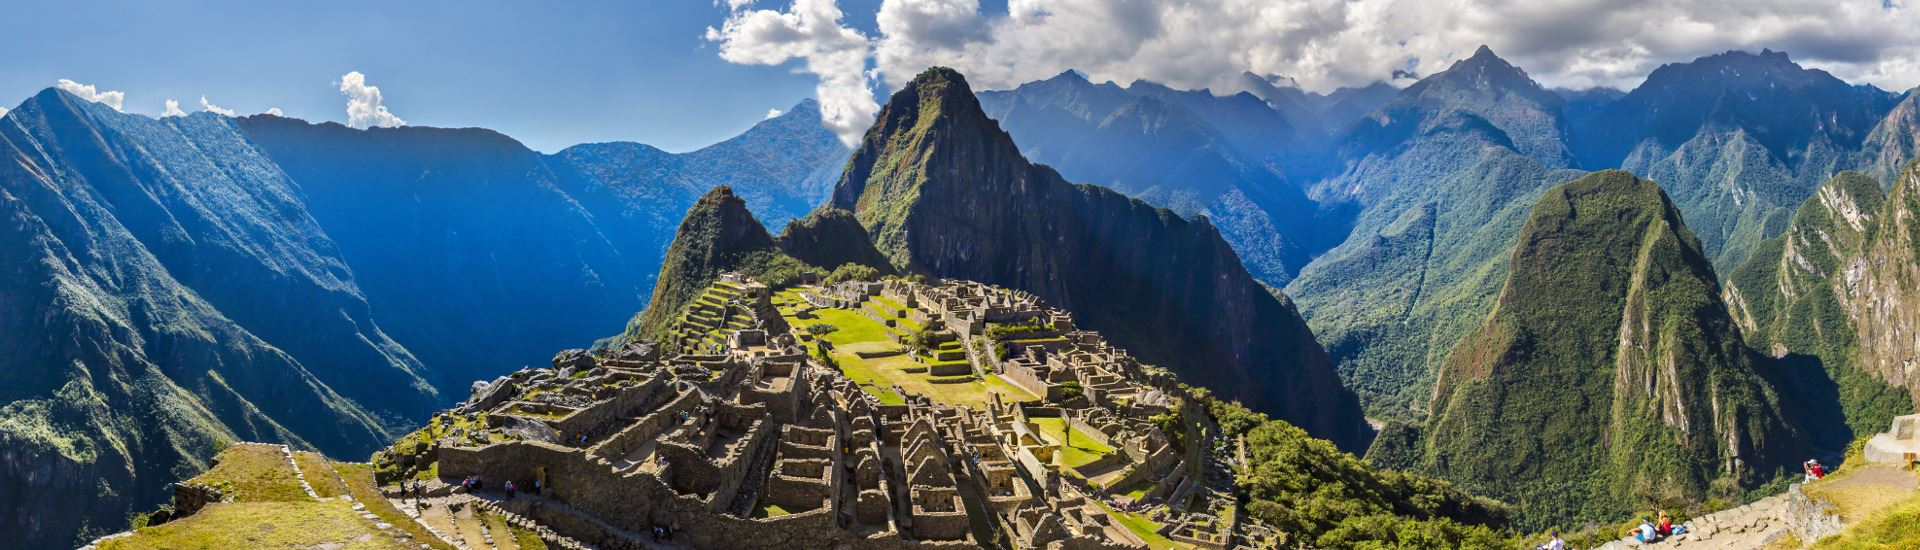 Über Peru